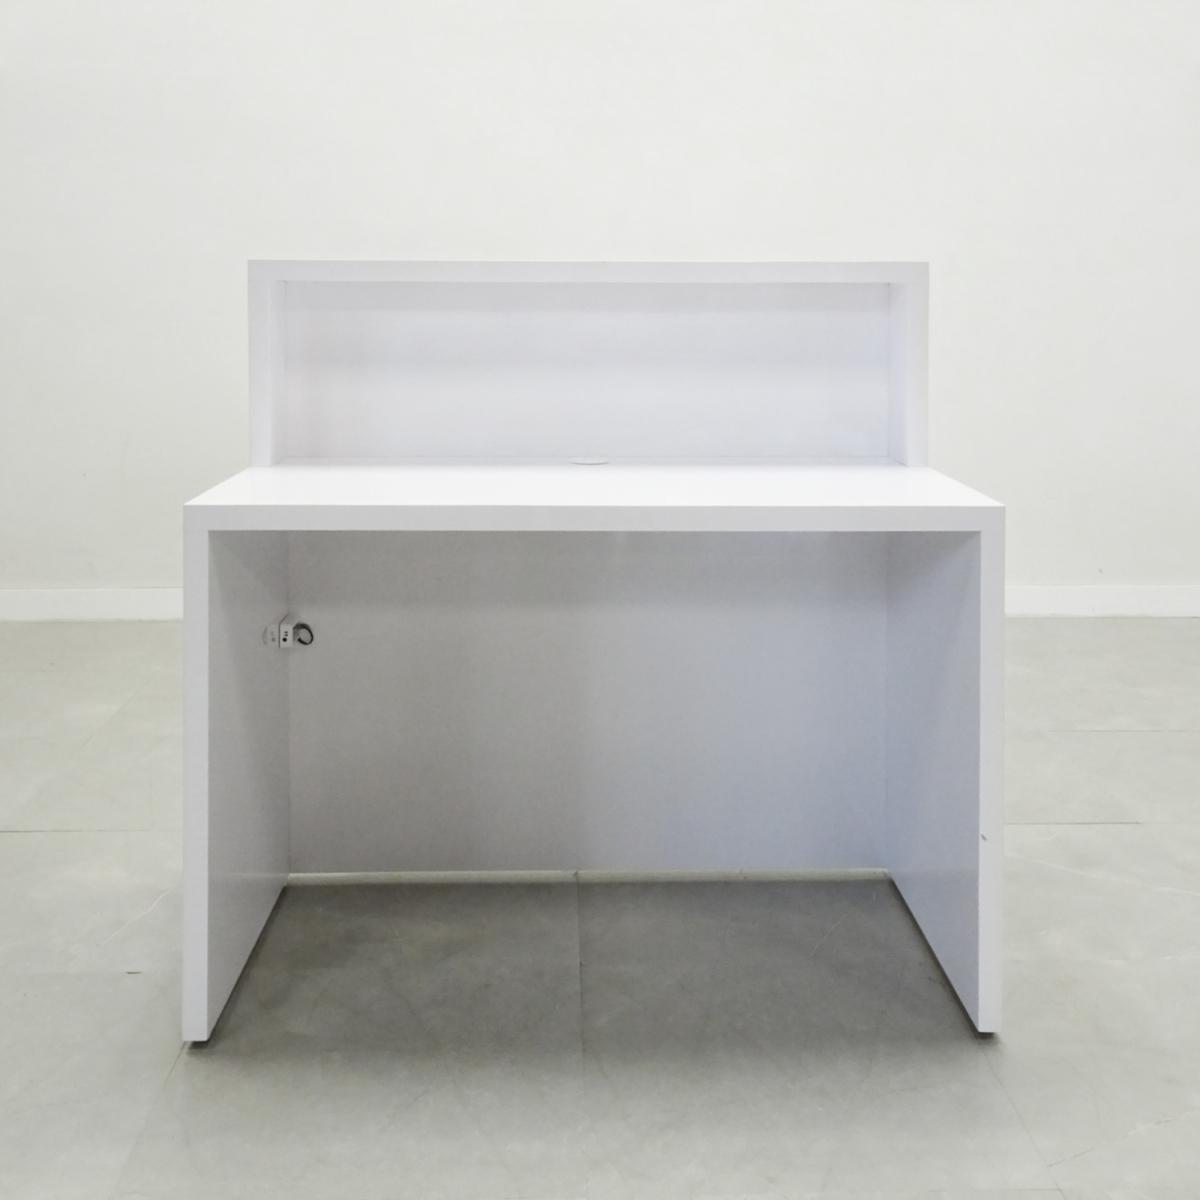 54 In. San Francisco Straight Reception Desk in White Gloss